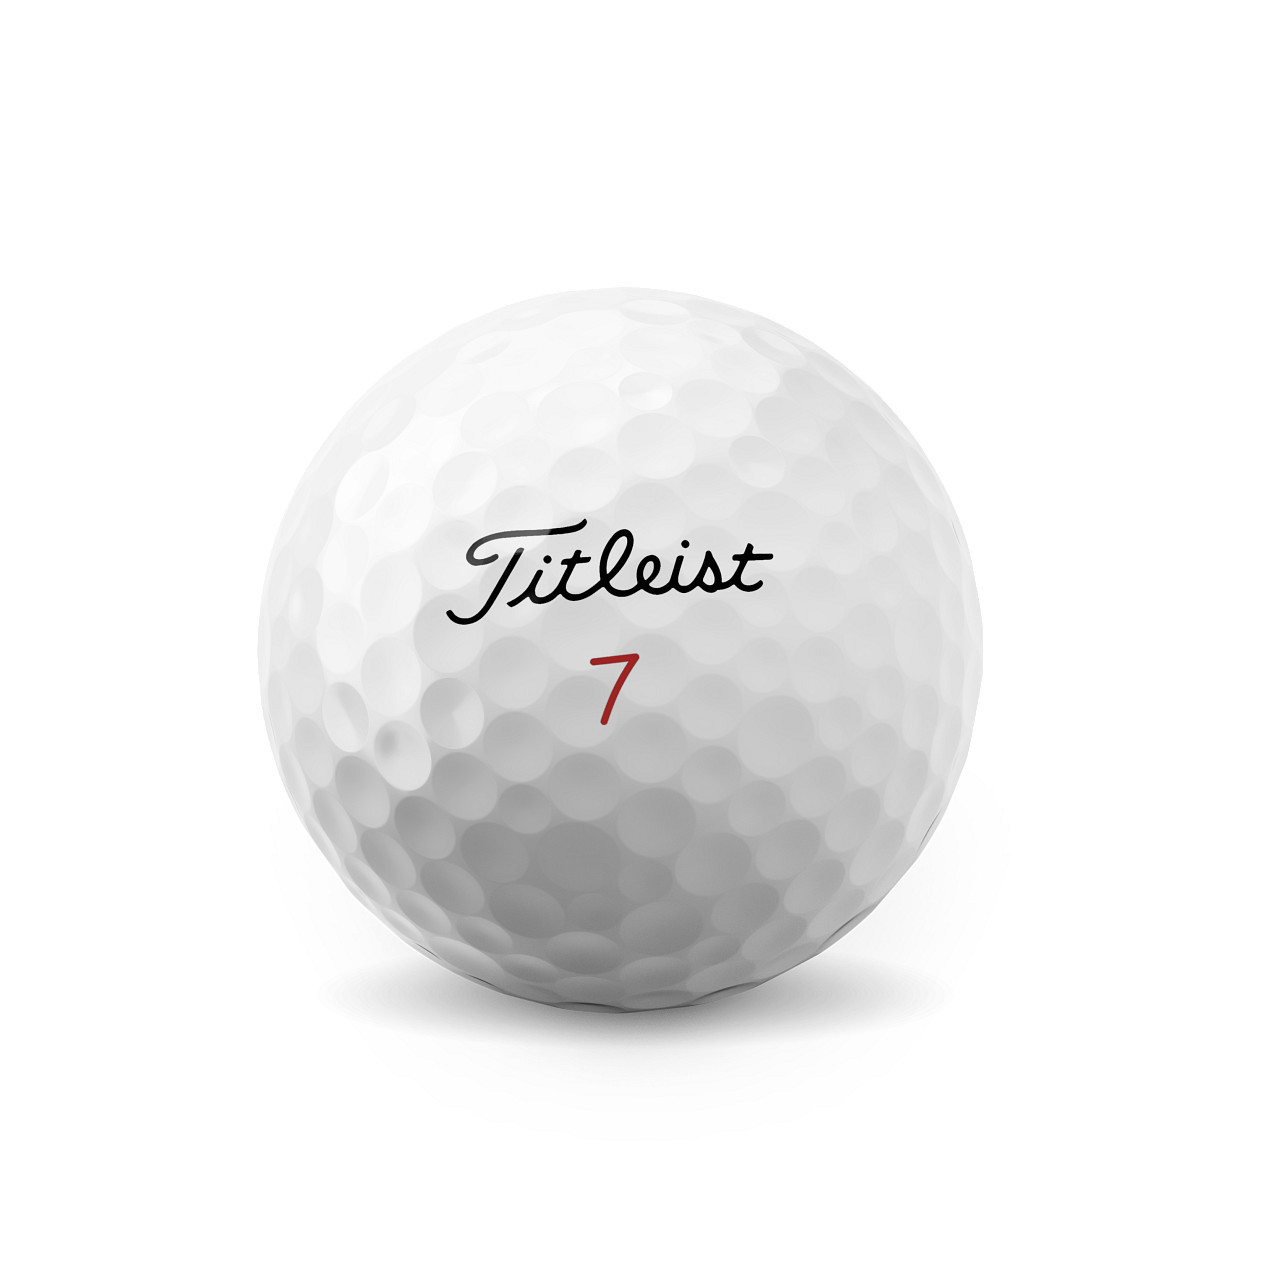 Titleist Personalized Pro V1x Dozen Golf Balls 2021 - High Numbers (#5 - #8)